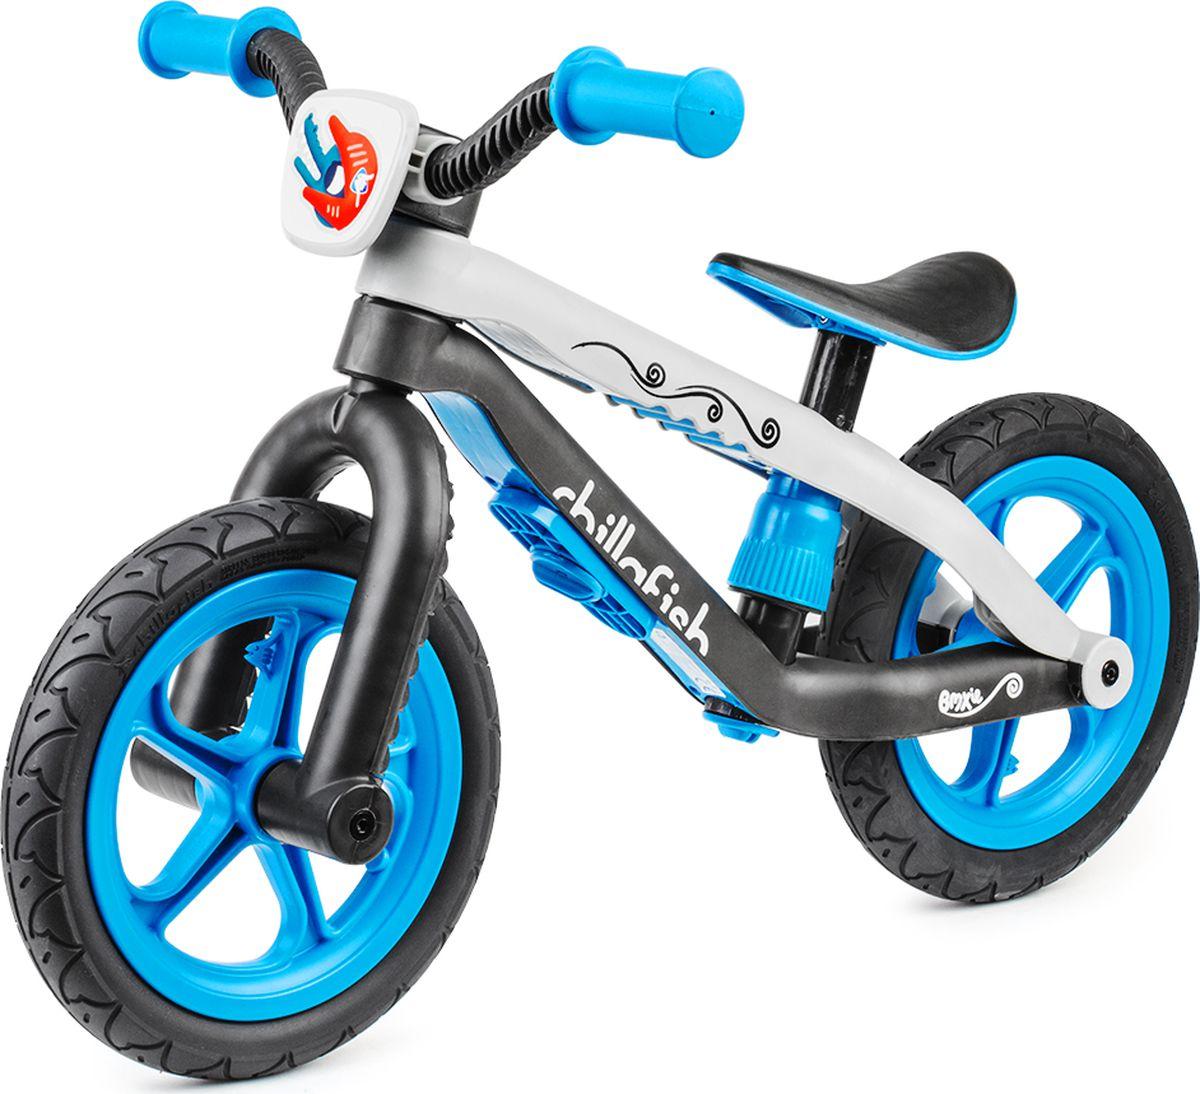 Chillafish Беговел детский BMXie-RS цвет синий -  Беговелы